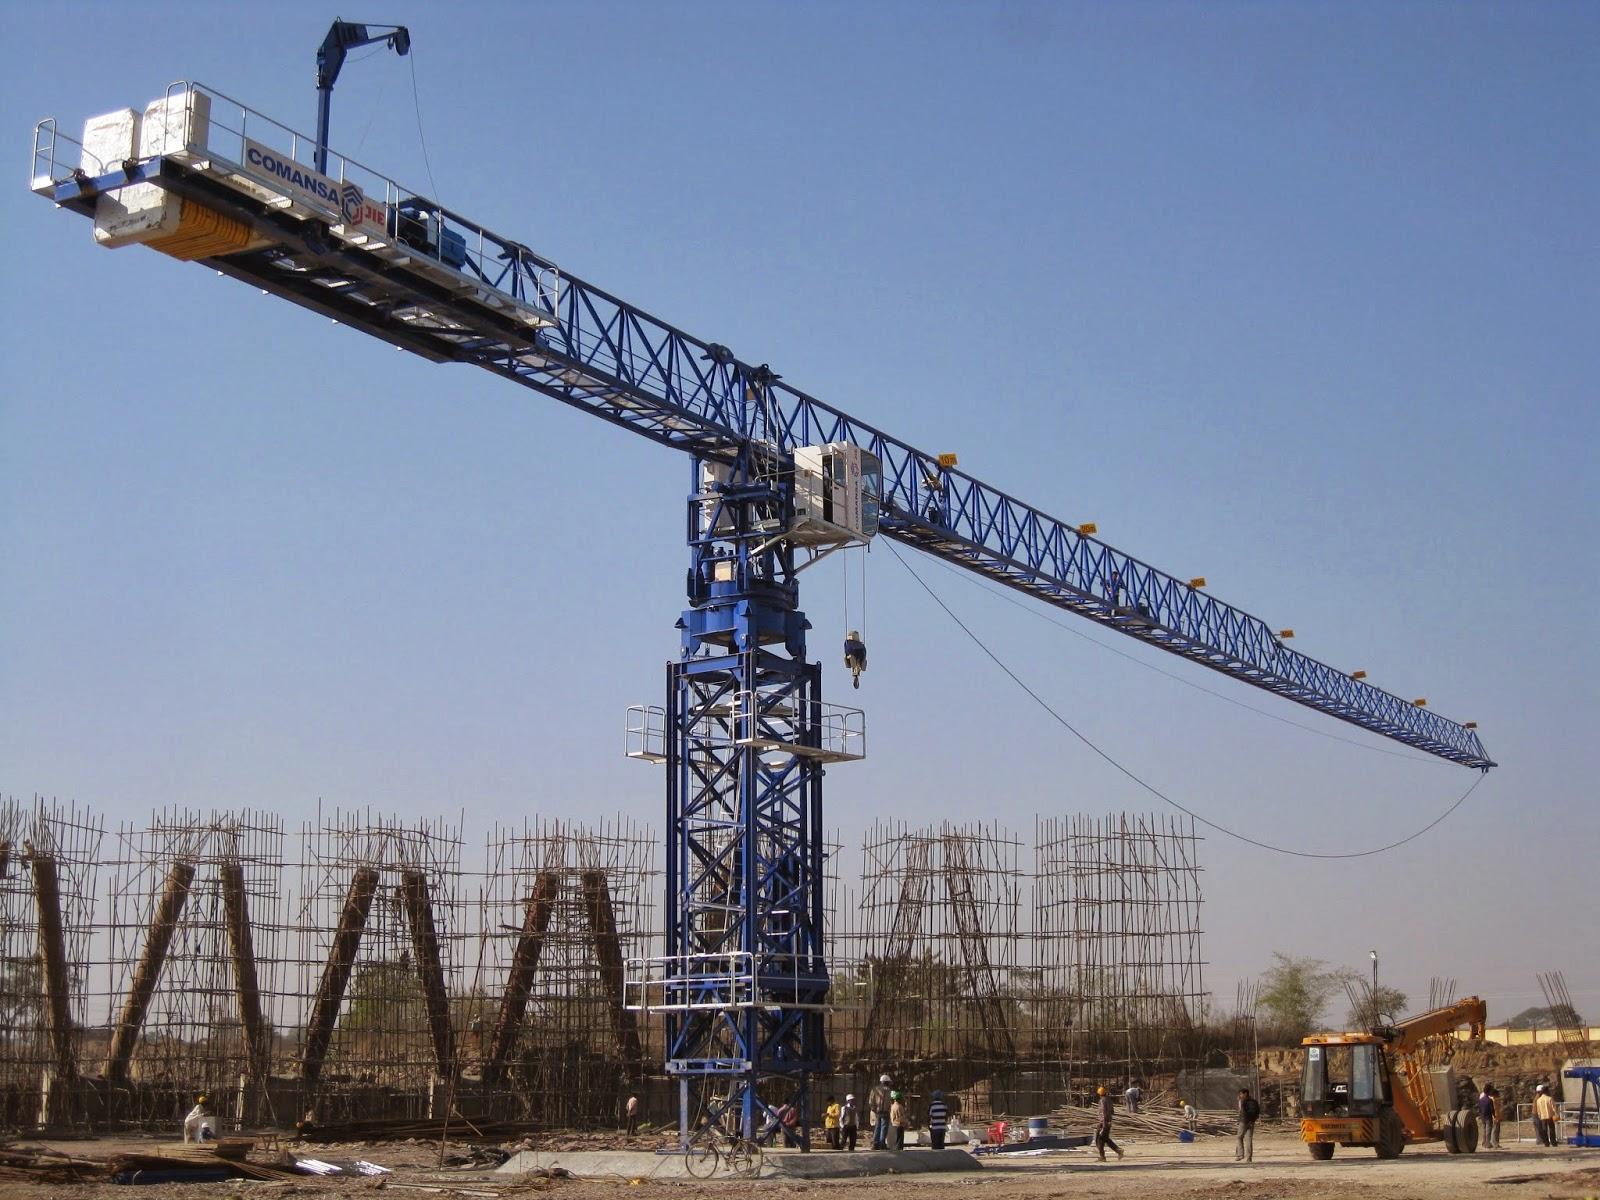 Tower Crane Inventor : Machines australia timeline of crane evolution